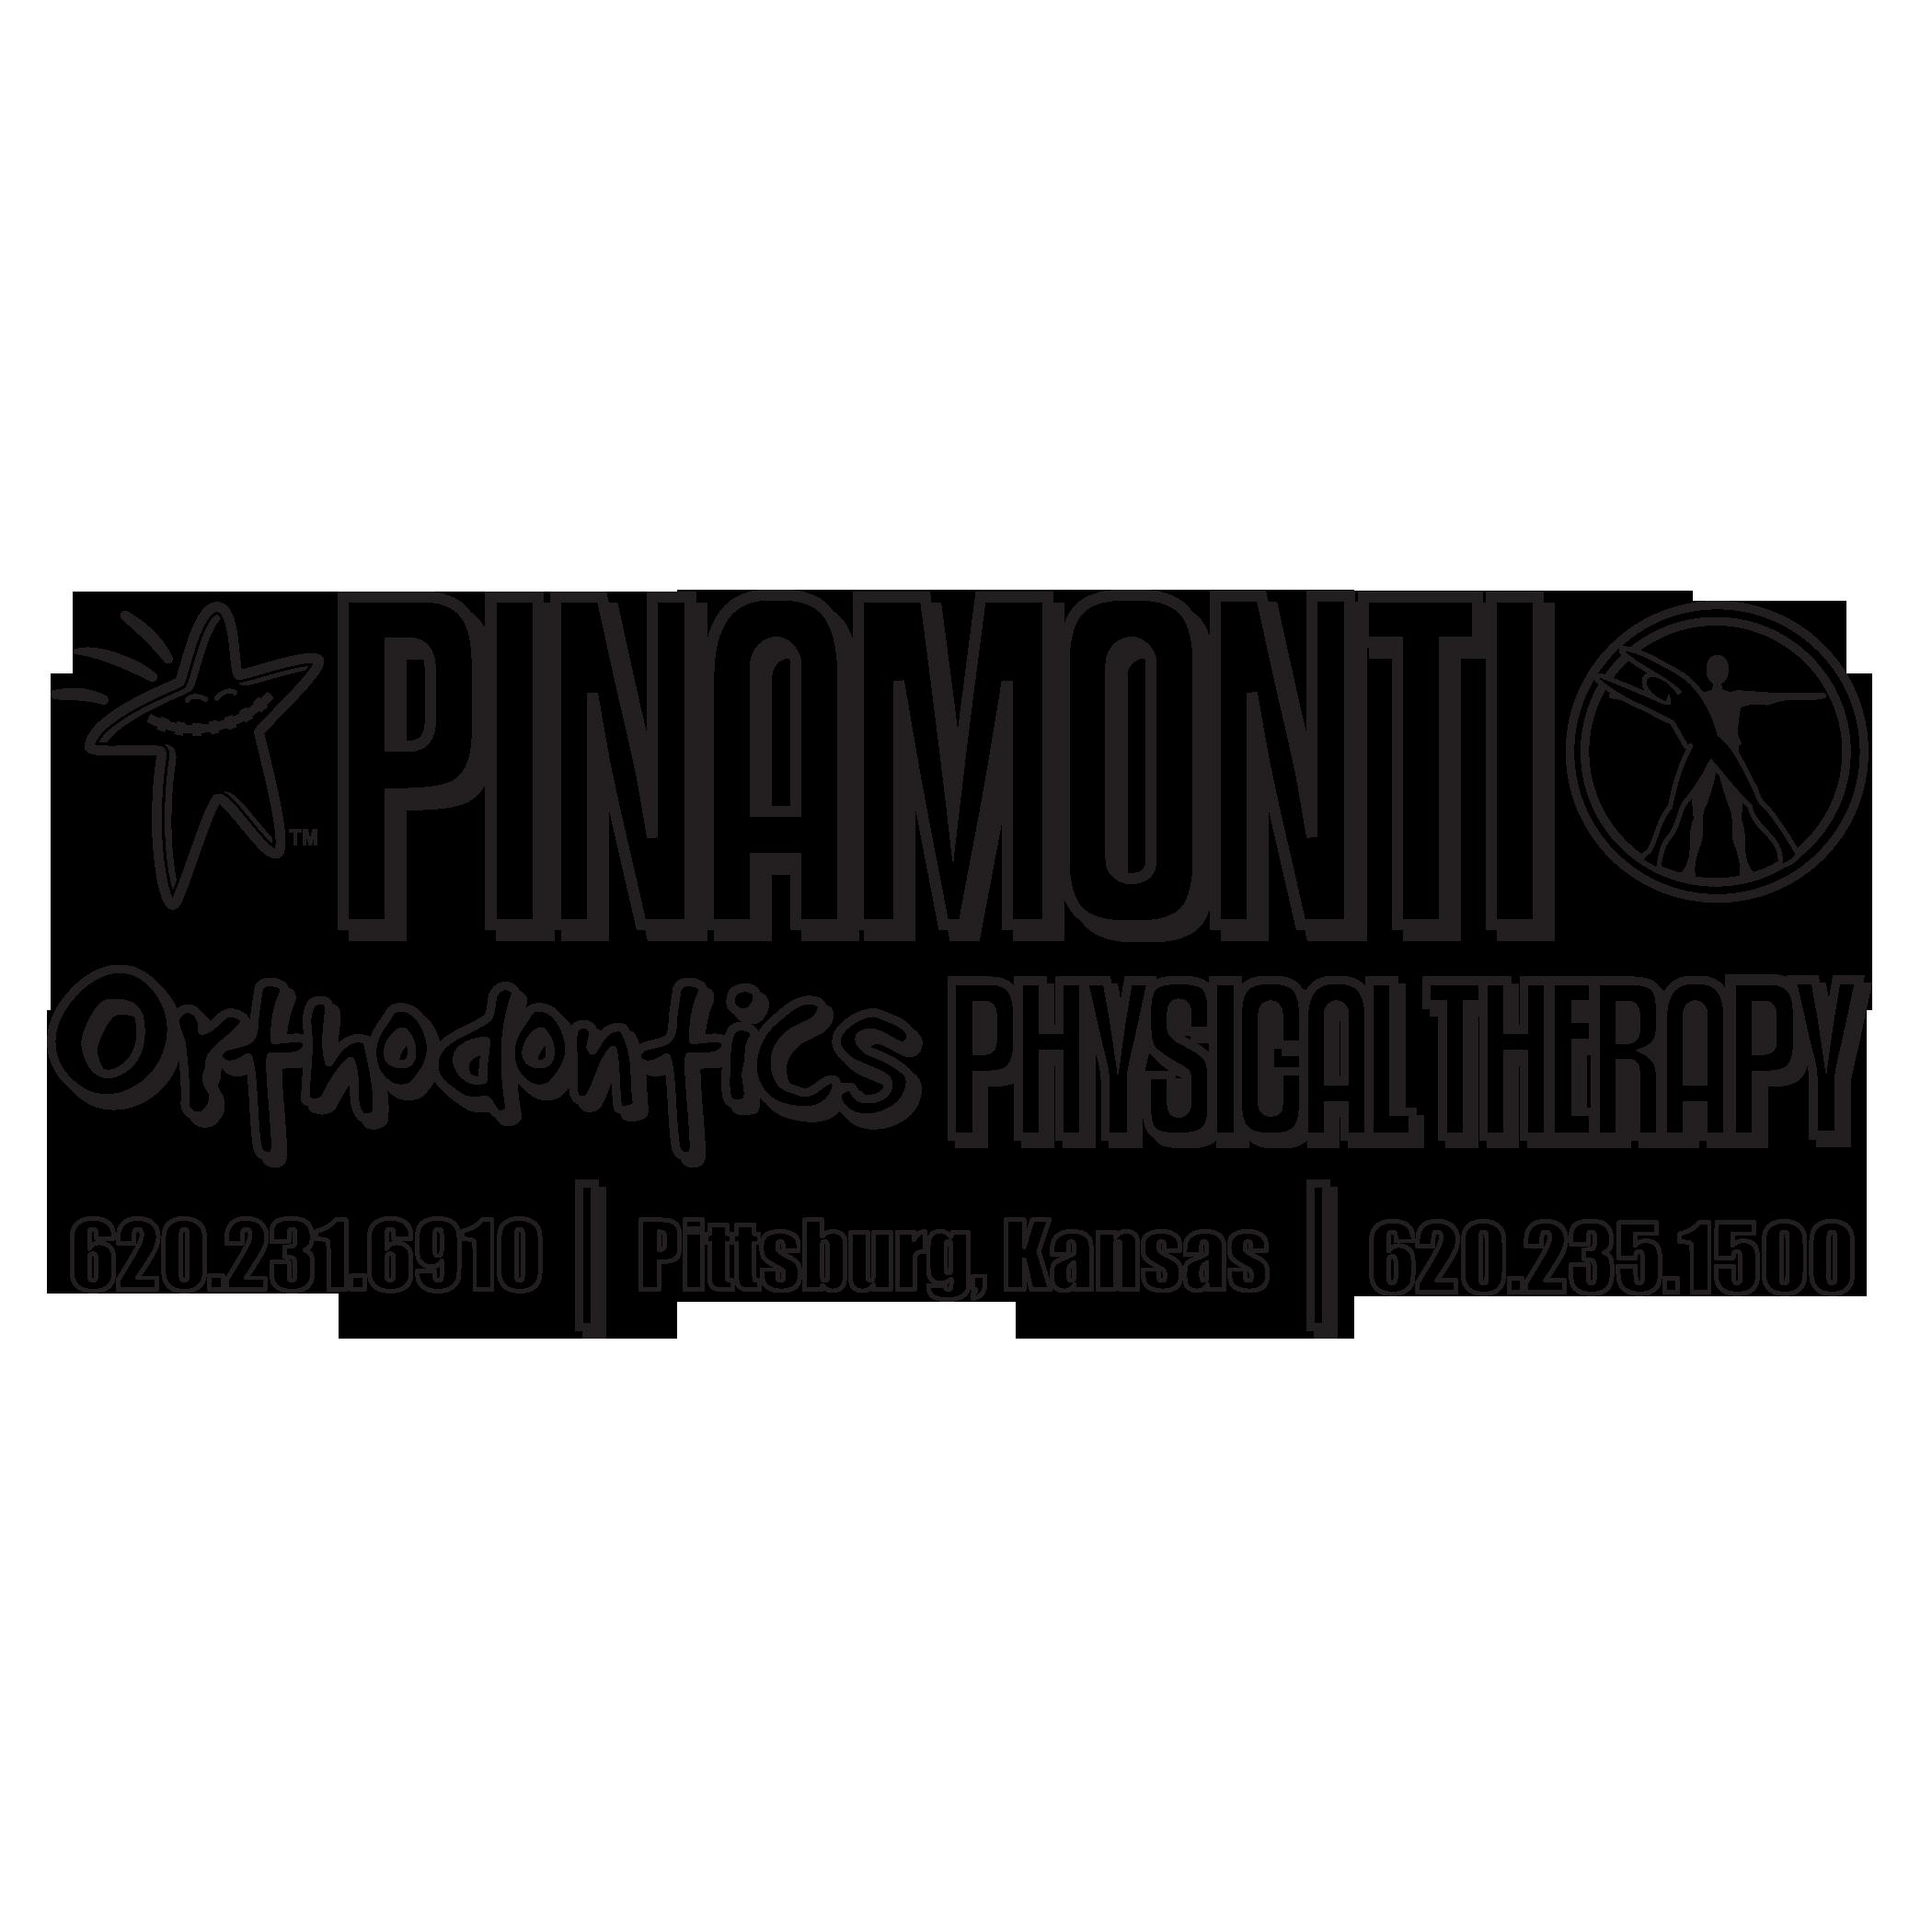 PINAMONTI.png